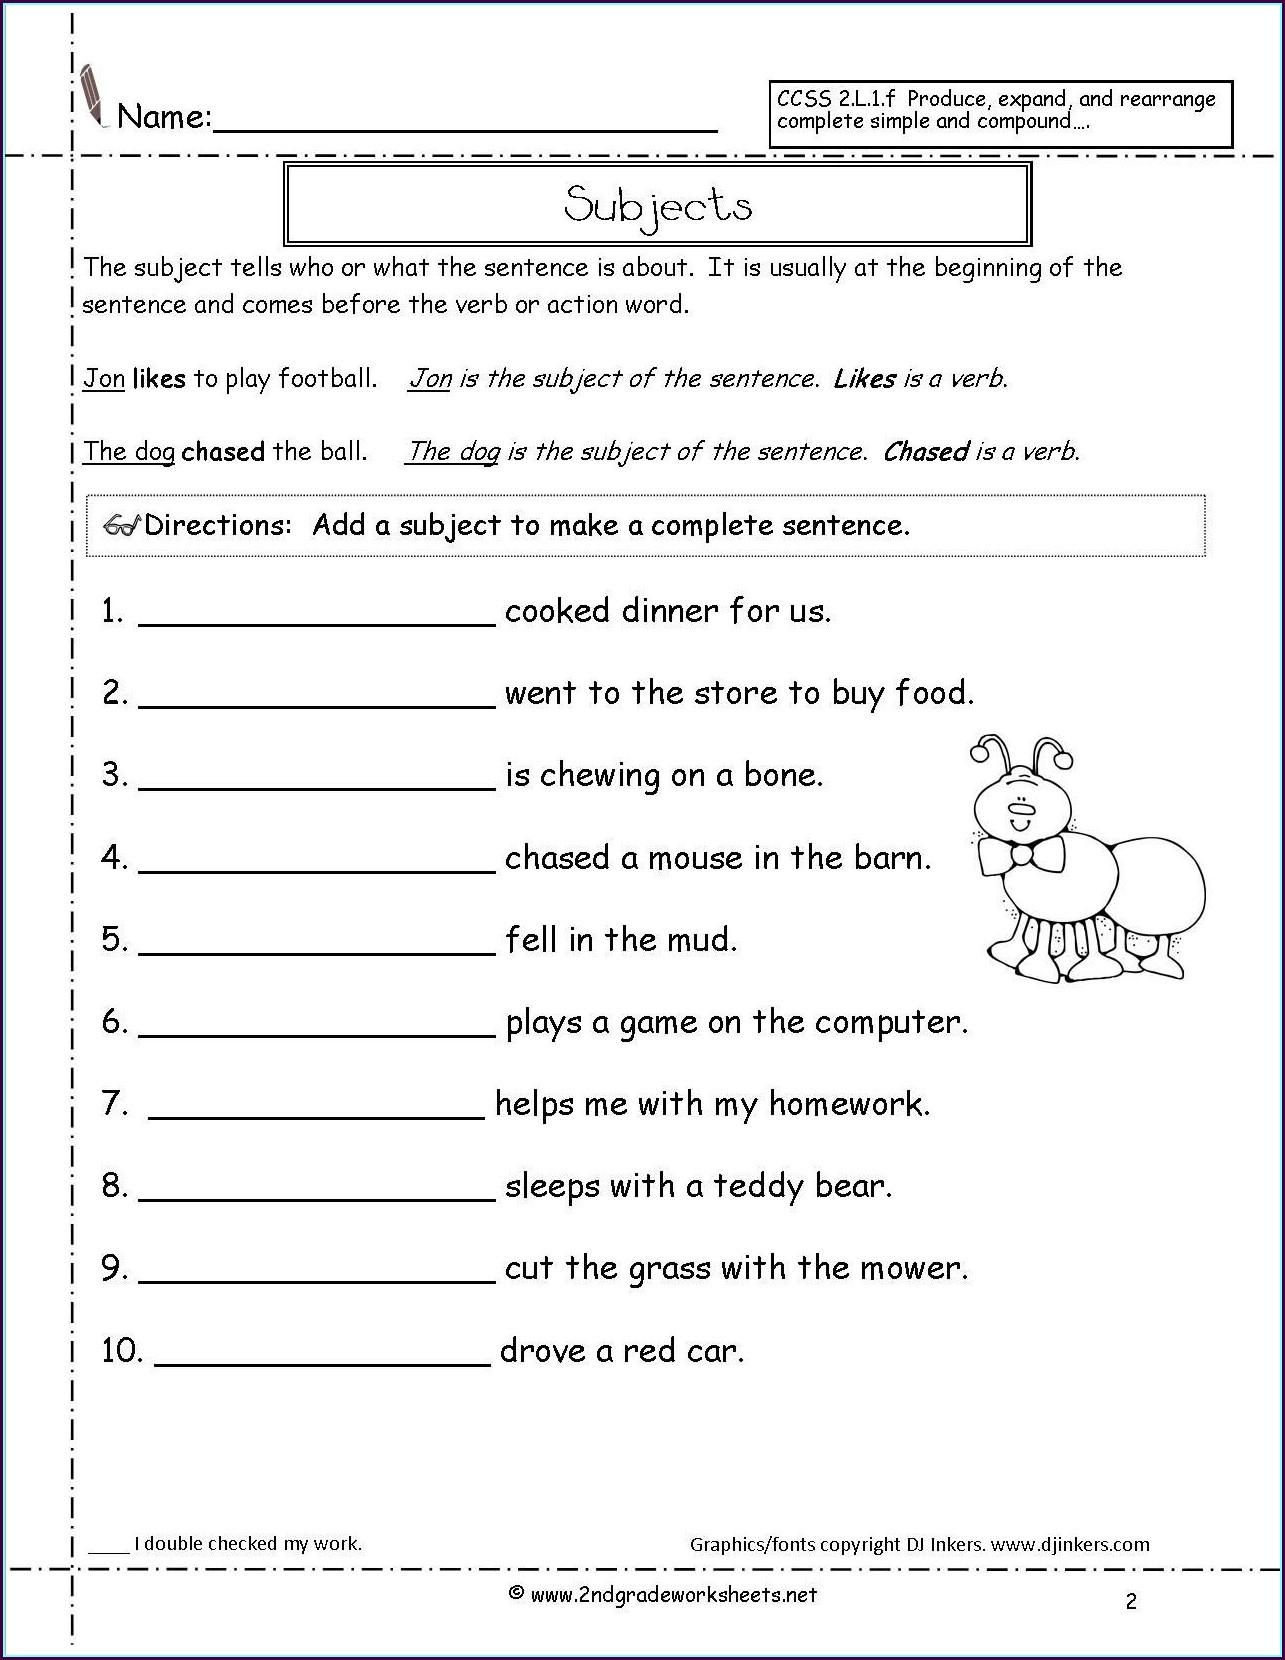 Printable 2nd Grade Grammar Worksheets